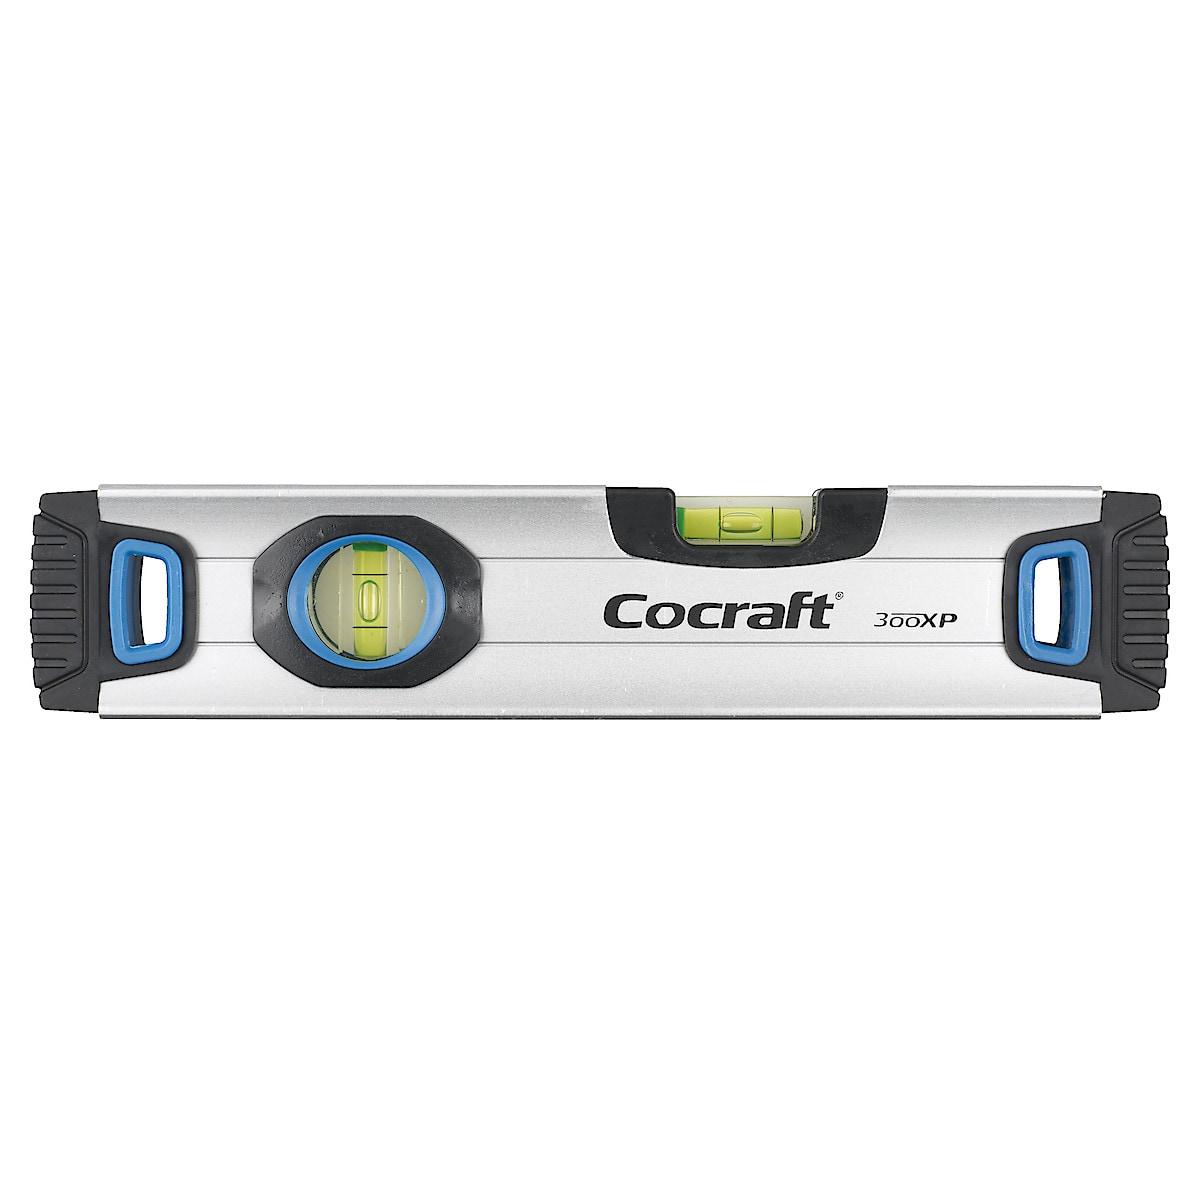 Cocraft vaterpass